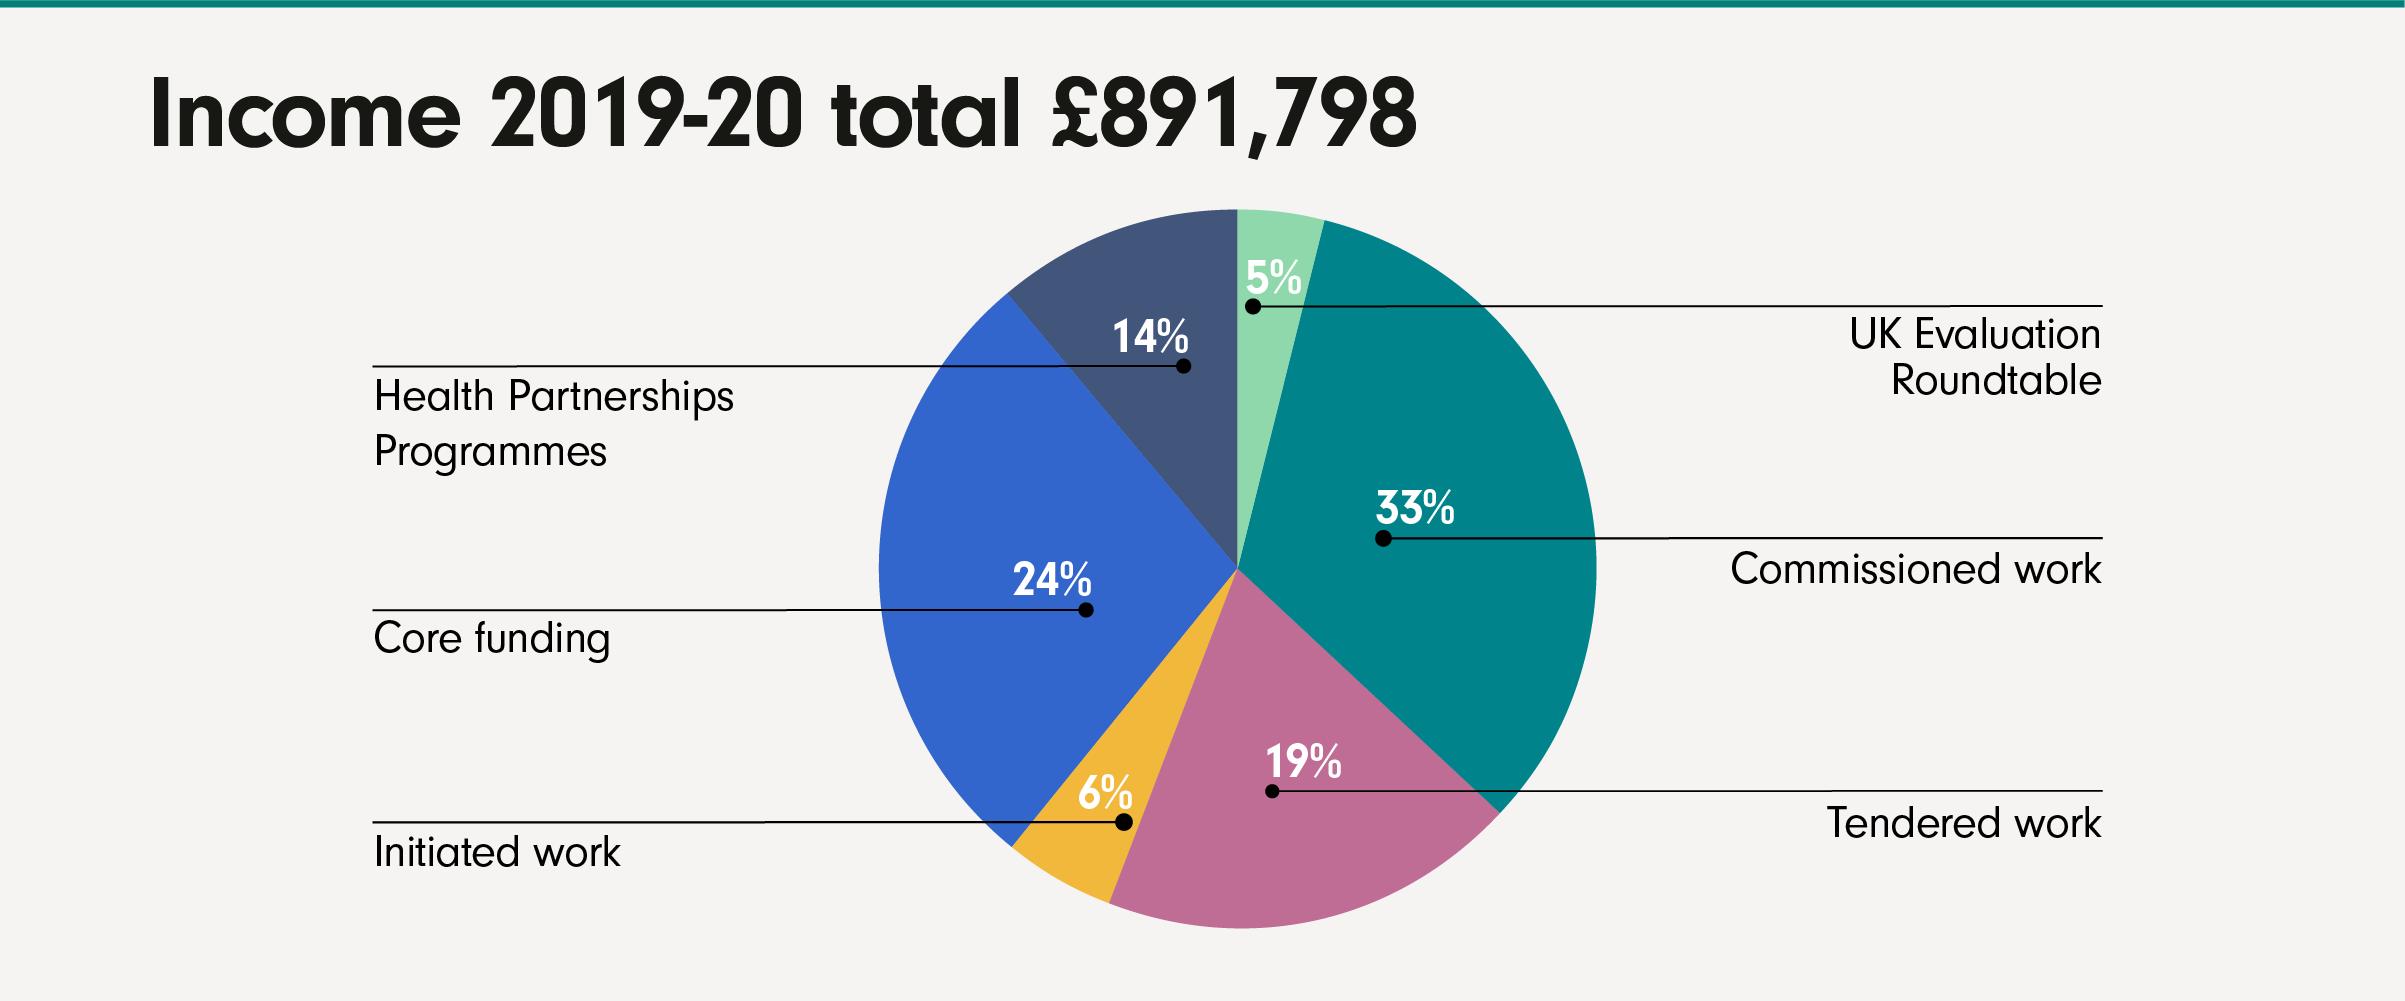 IVAR004—2019-20 Income chart